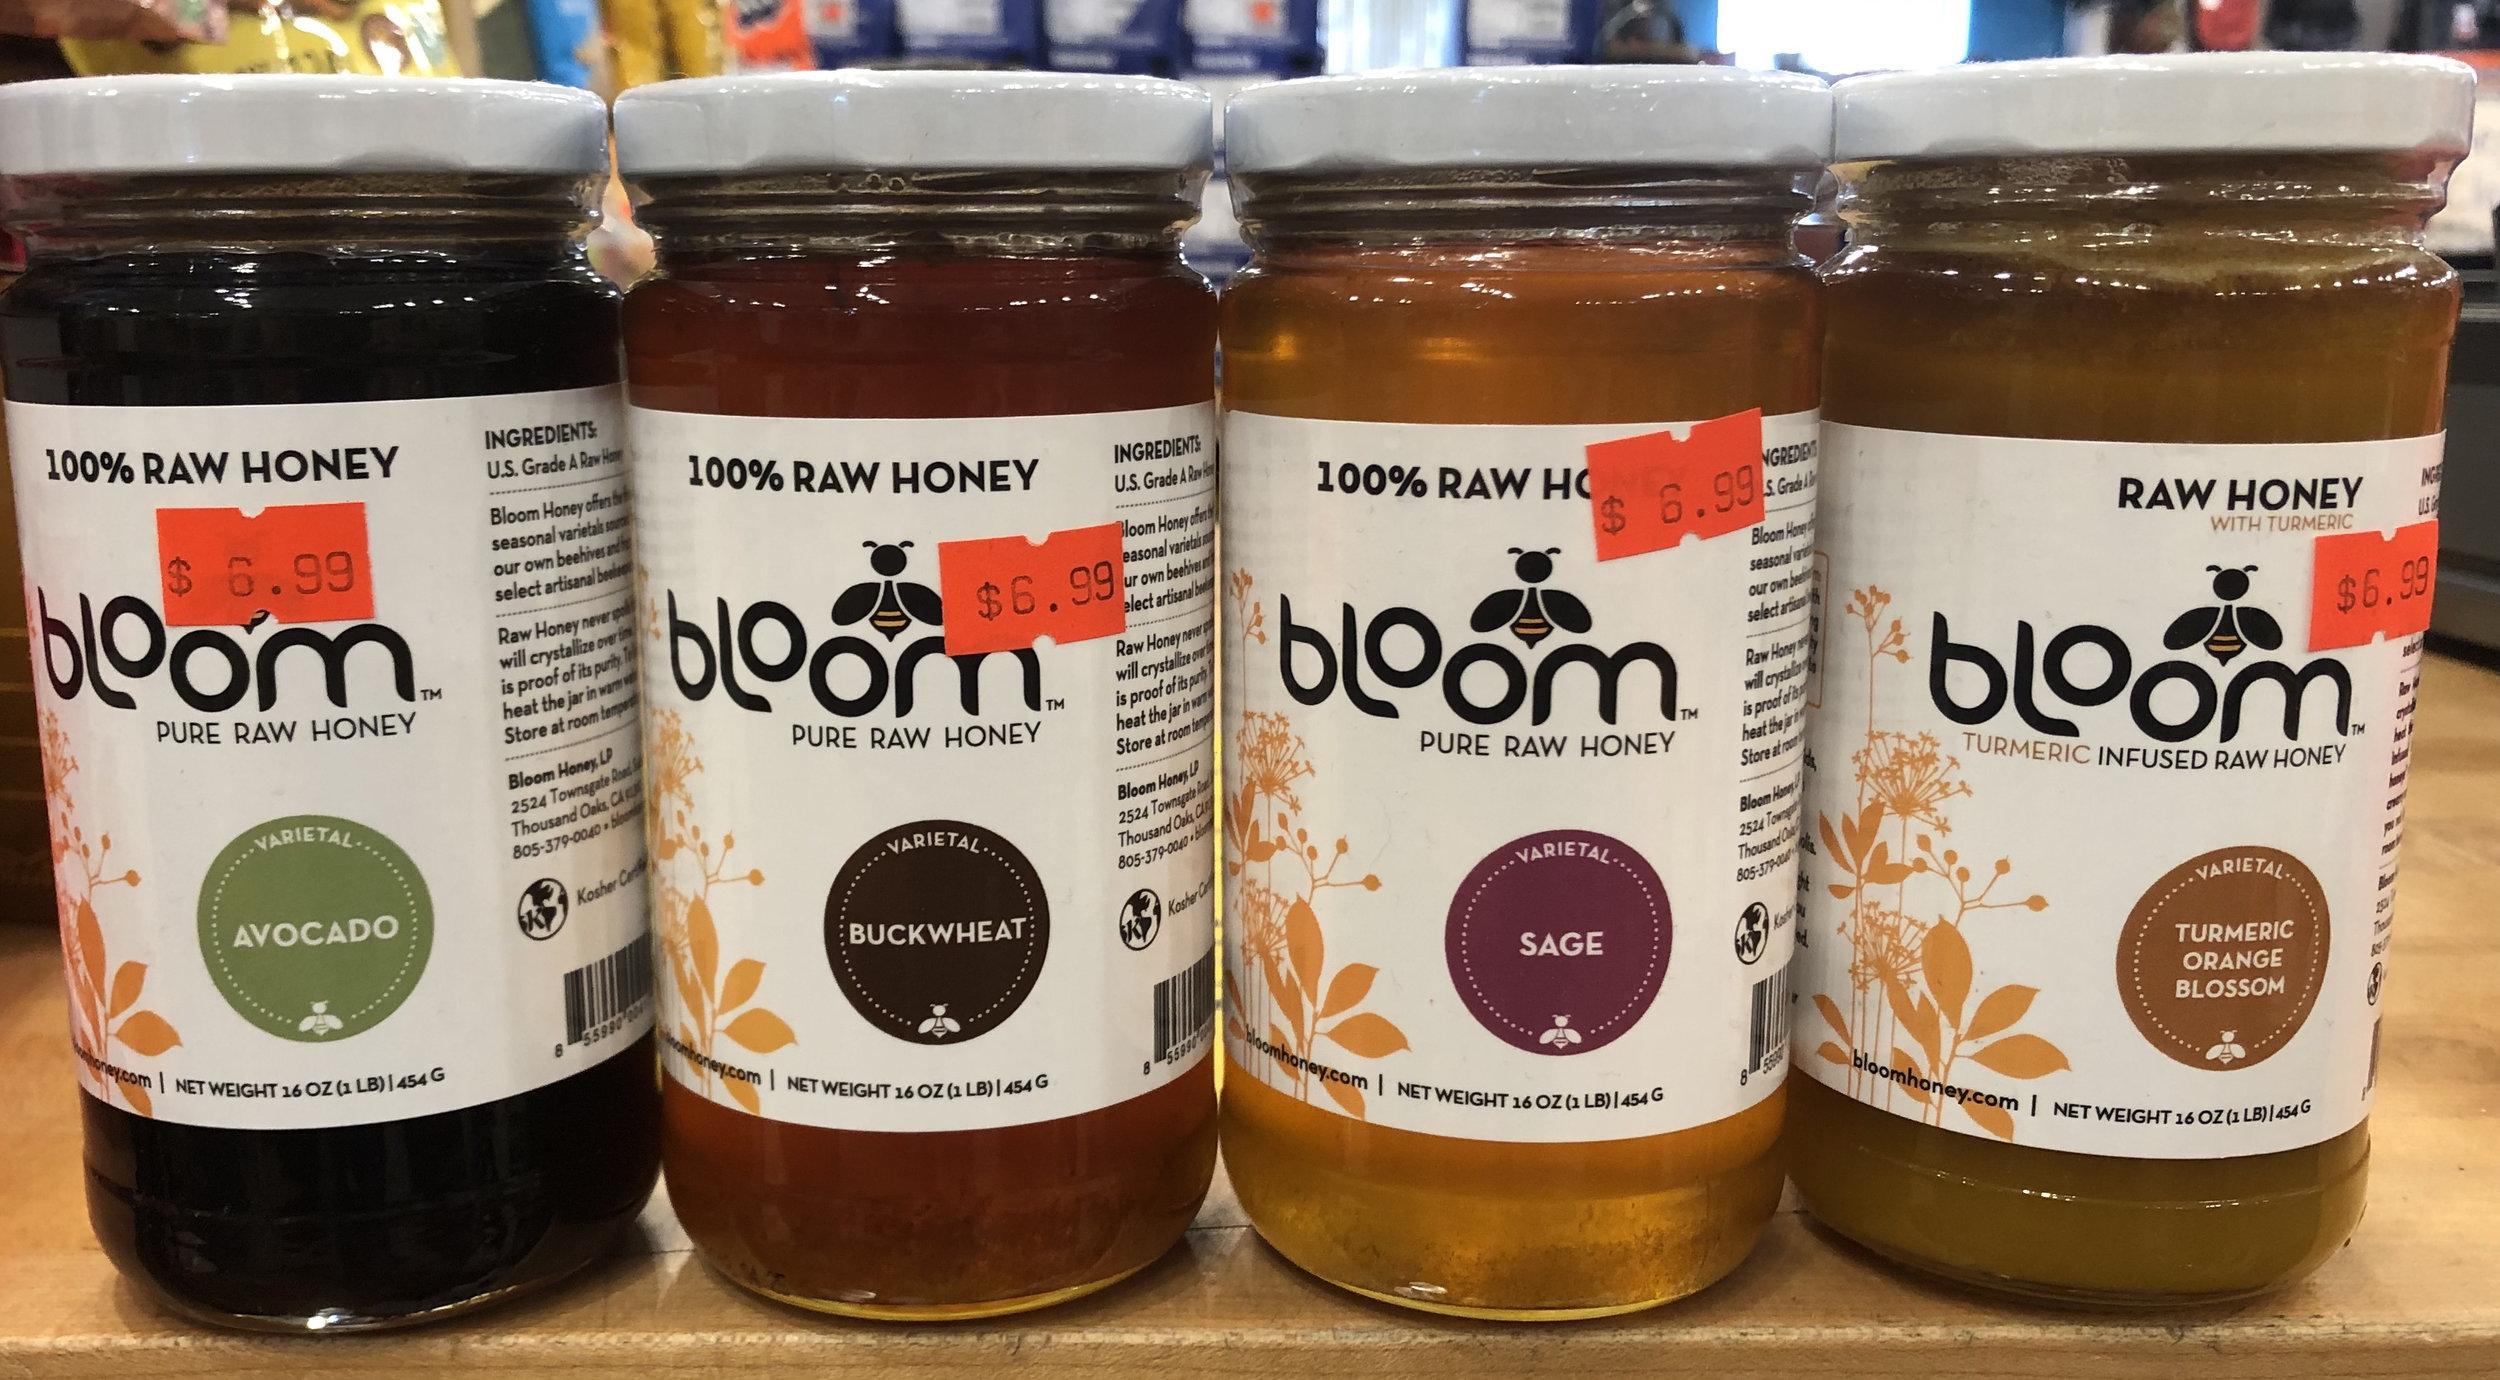 Bloom 100% Raw Honey - Avacado, Buckwheat, Sage, Turmeric Orange Blossom